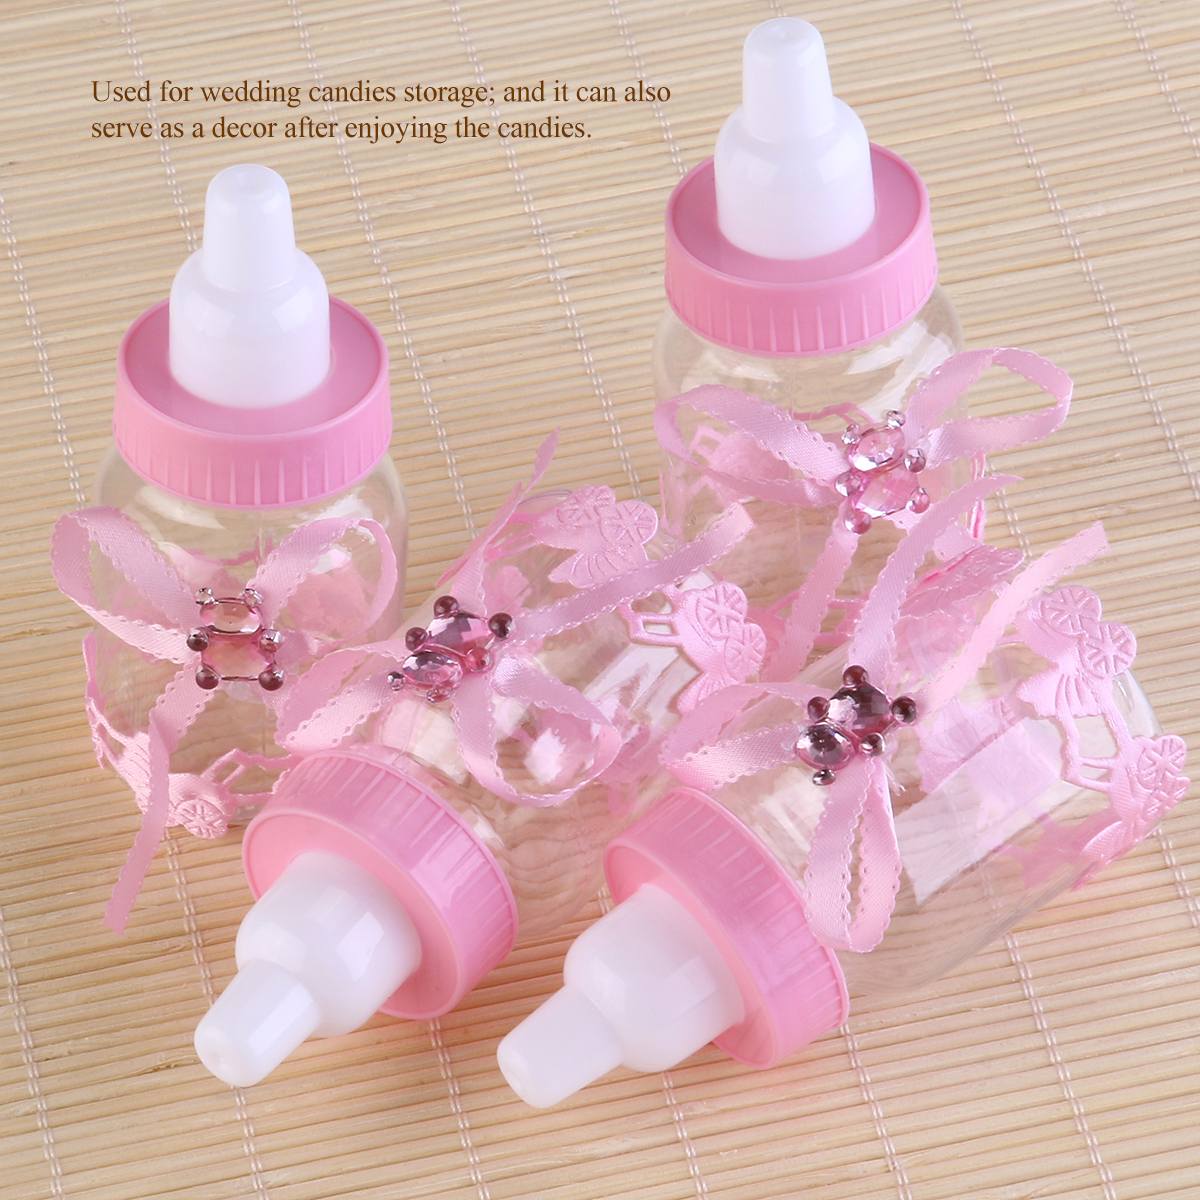 12pcs Feeding milk bottle Style Candy Bottle Gift Box Baby Shower ...